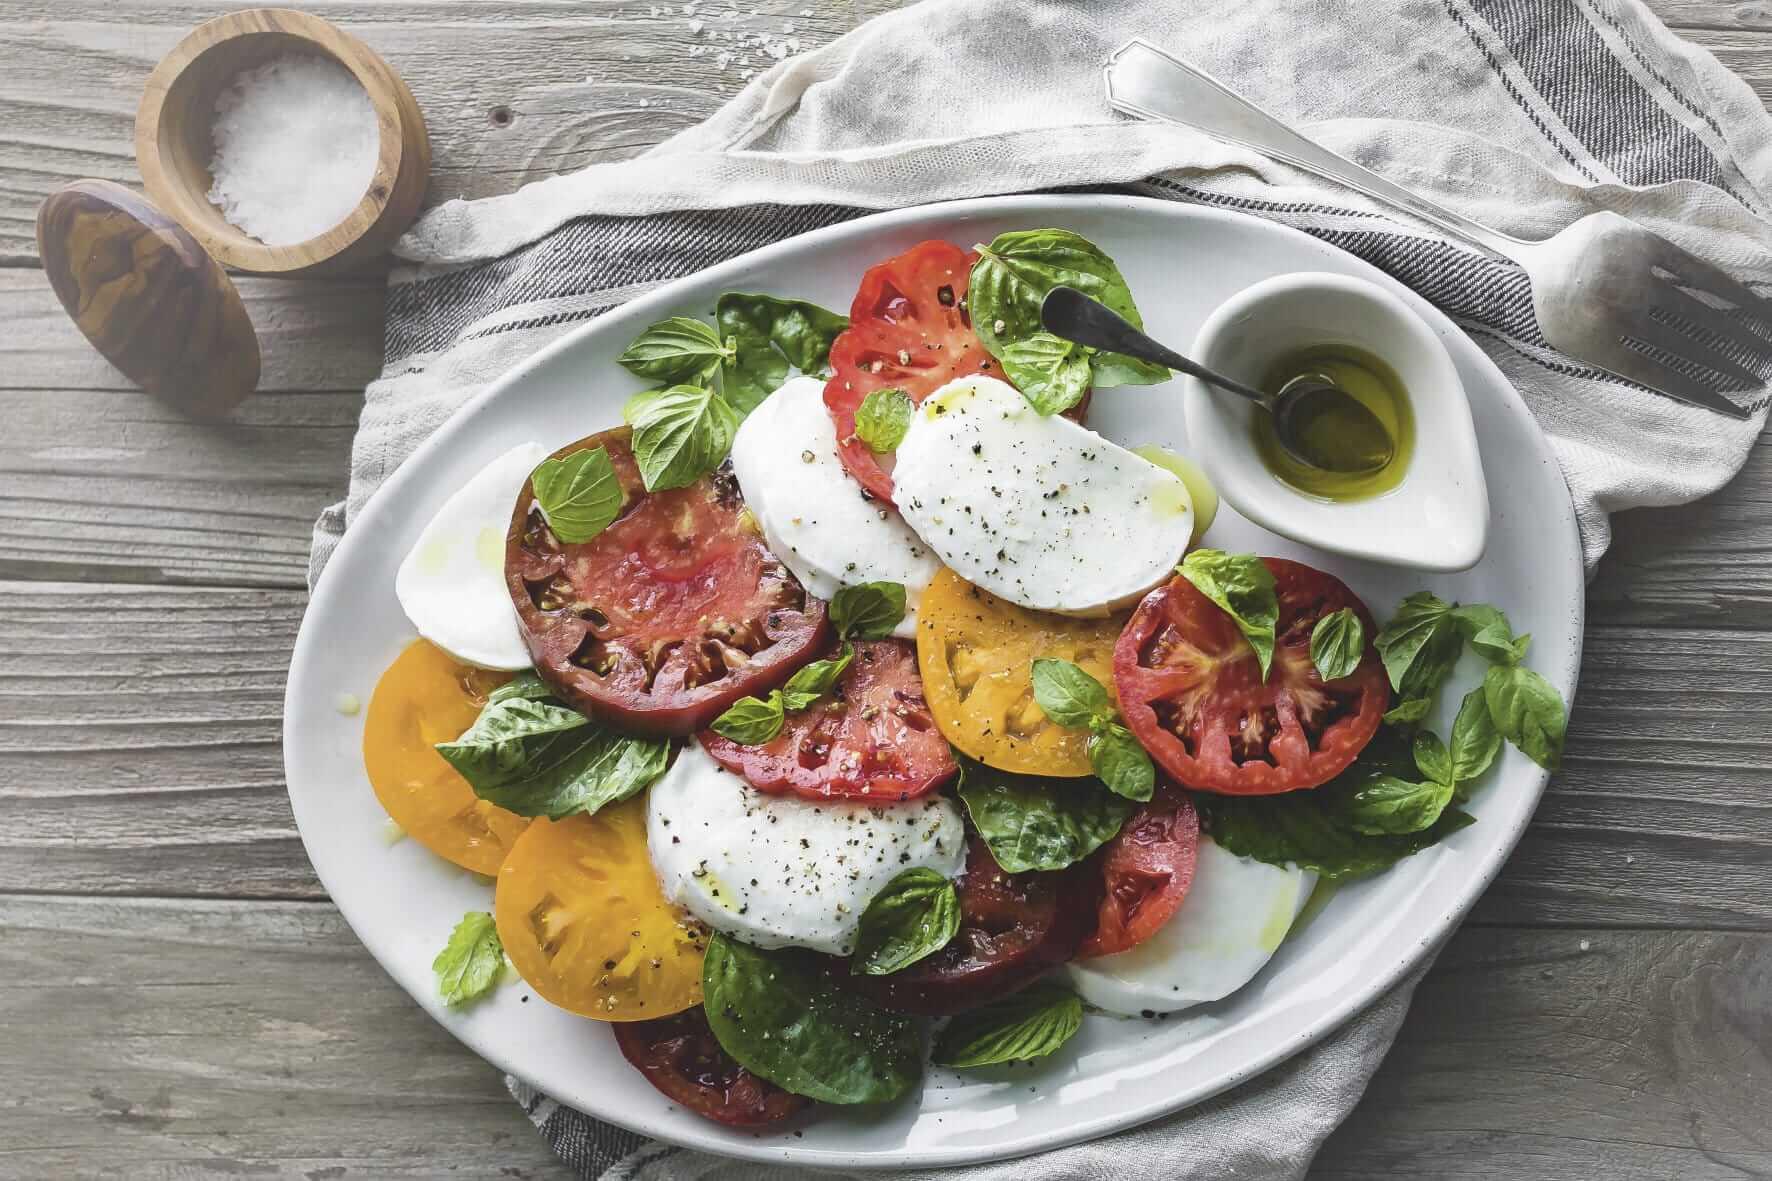 Galbani Mozzarella Classic Caprese Salad - Galbani